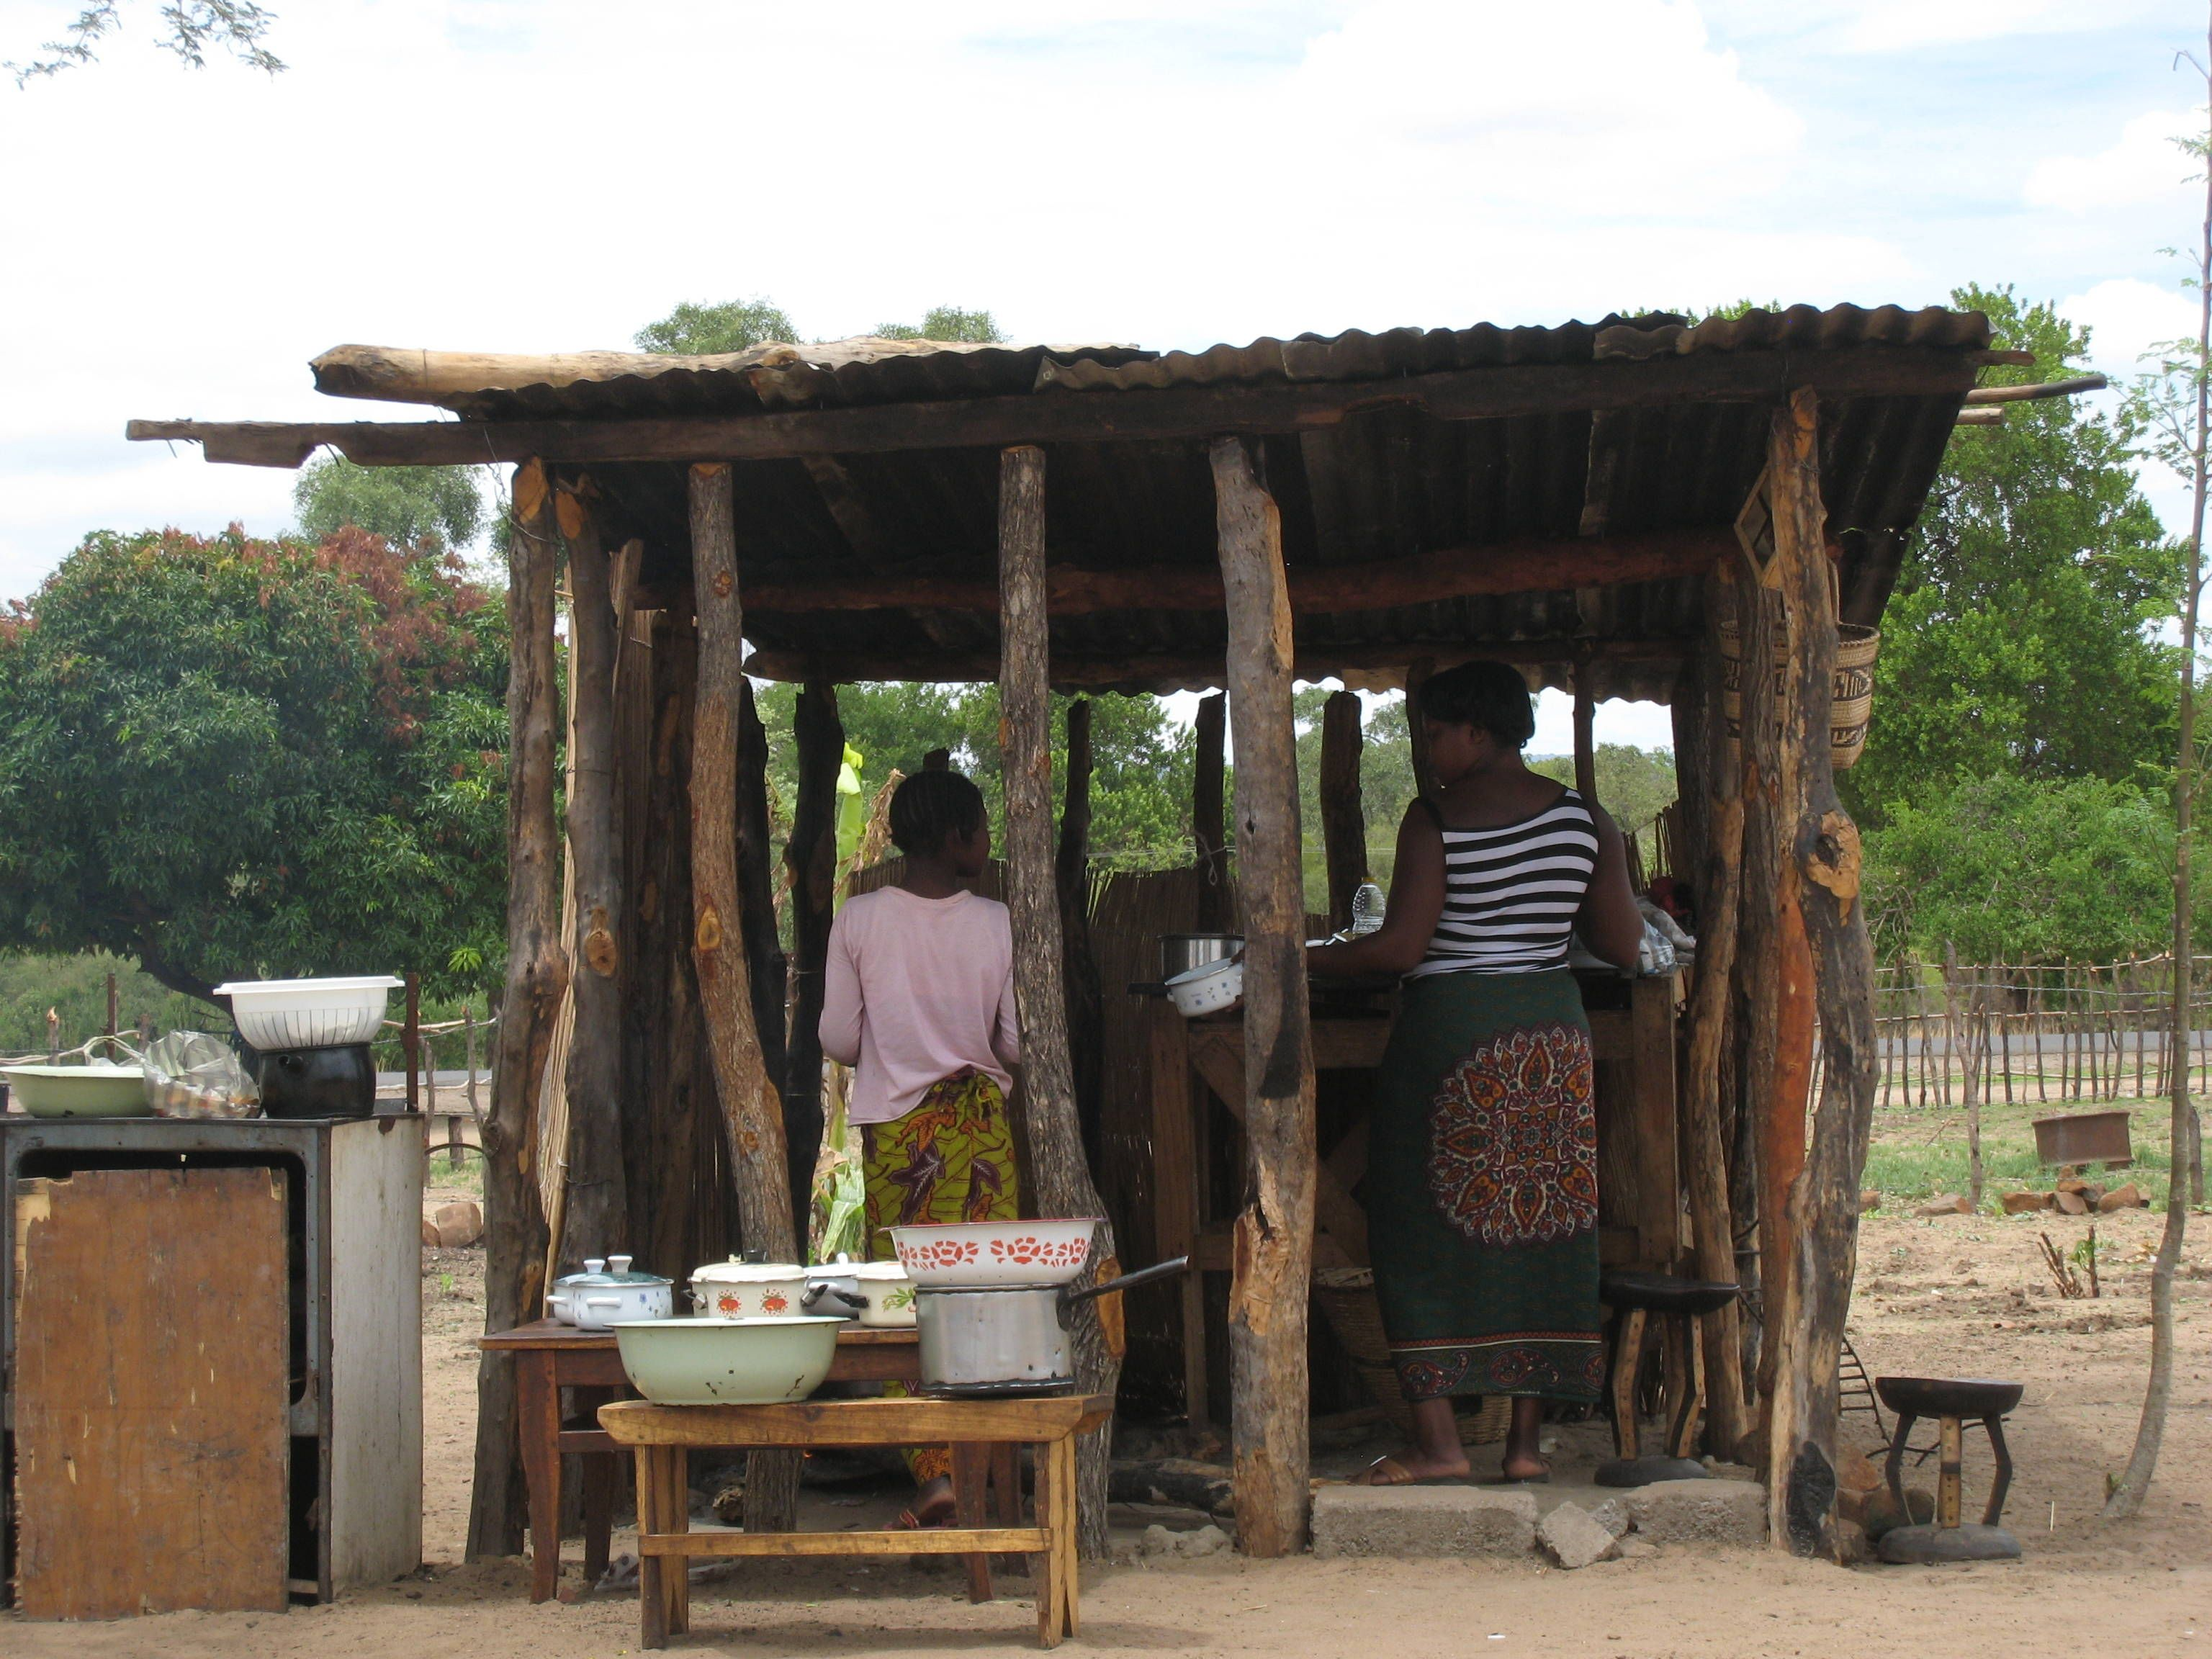 zambia kitchen Outdoor structures, Pergola, Outdoor